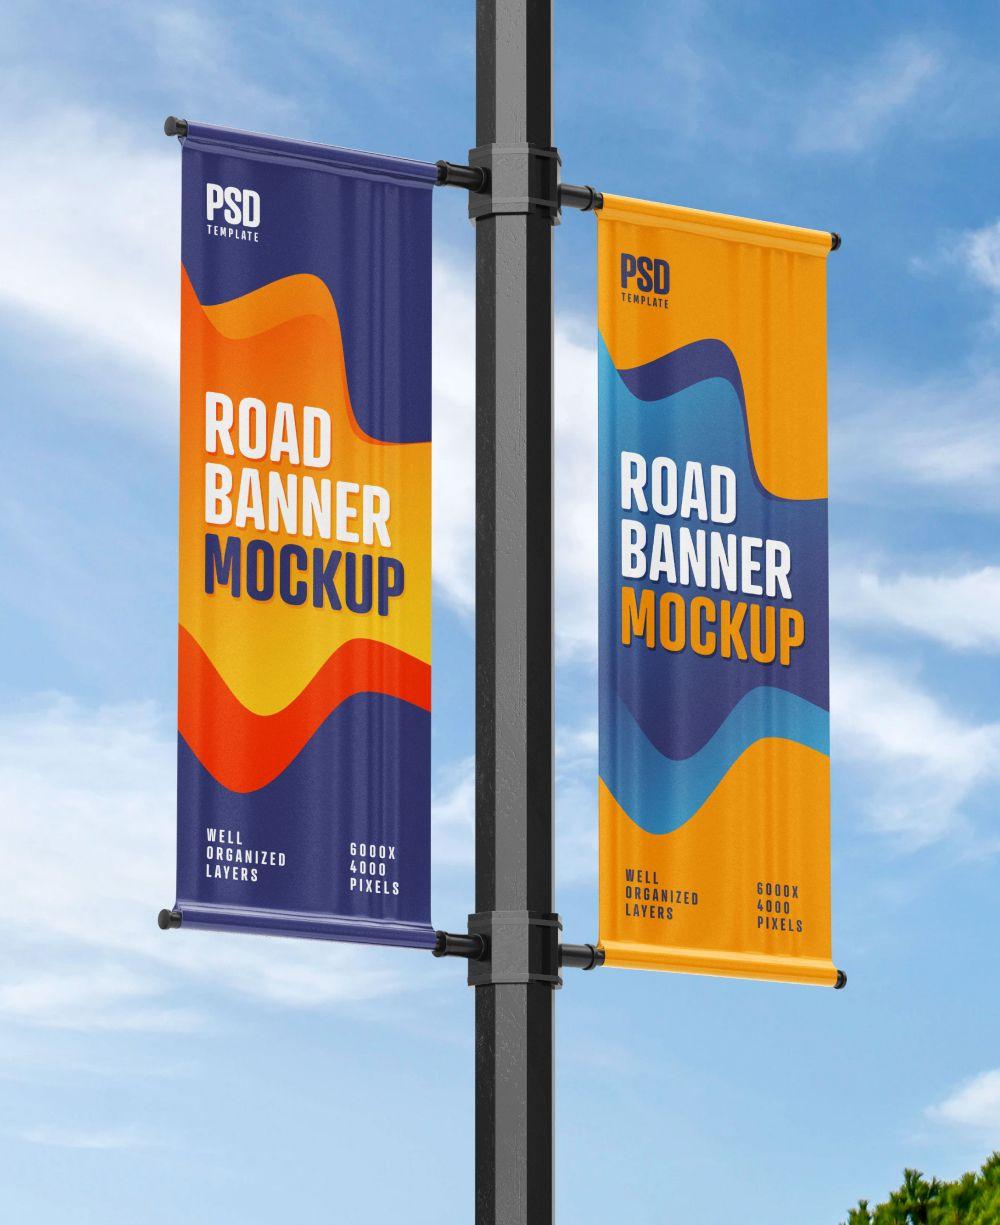 Street Pole Banner Mockup Set In 2021 Pole Banners Banner Design Inspiration Street Banners